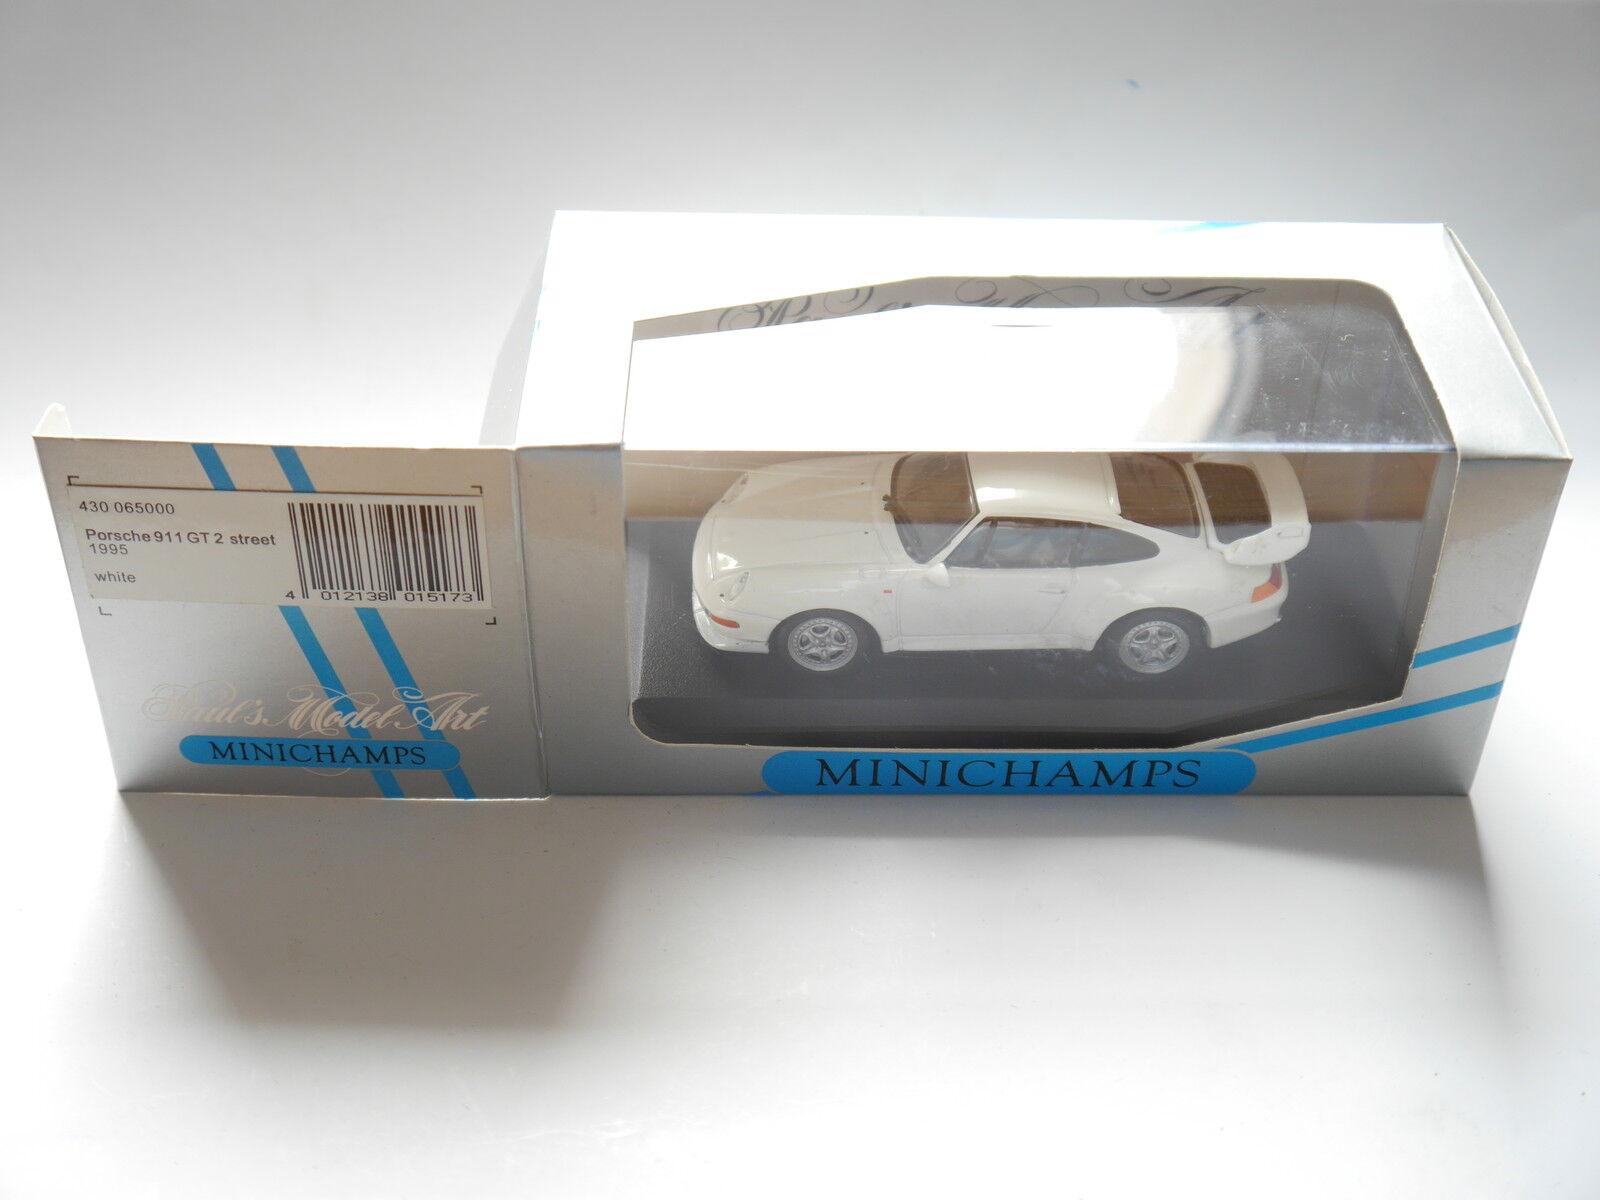 Porsche 911 gt2 street 1995 in weiss weiß, minichamps 430065000 1 43 boxed minze